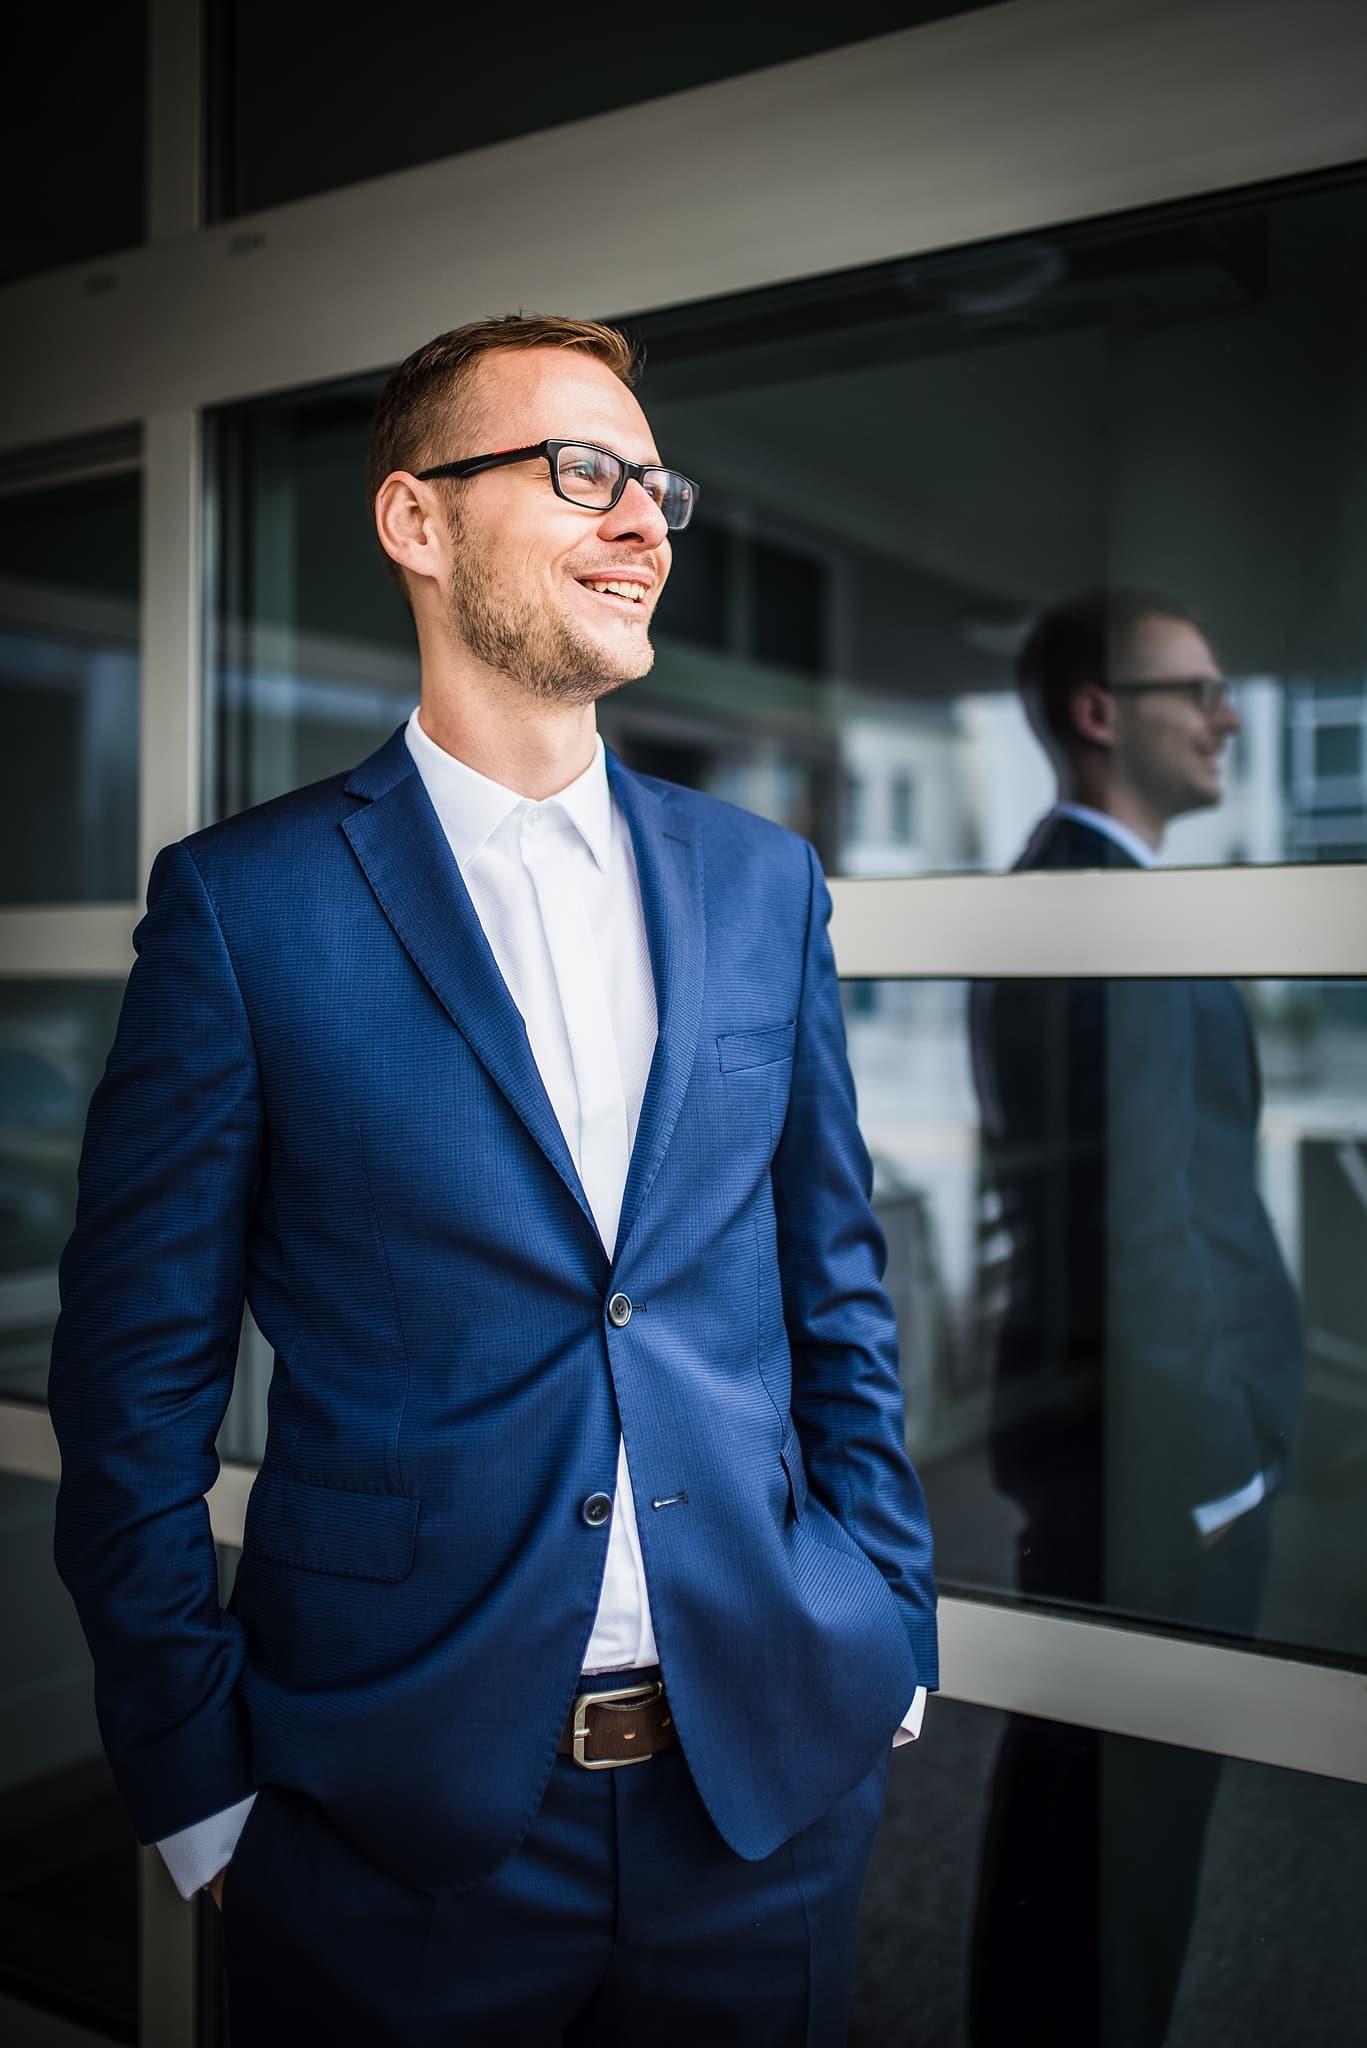 Male portraits: How to photograph men